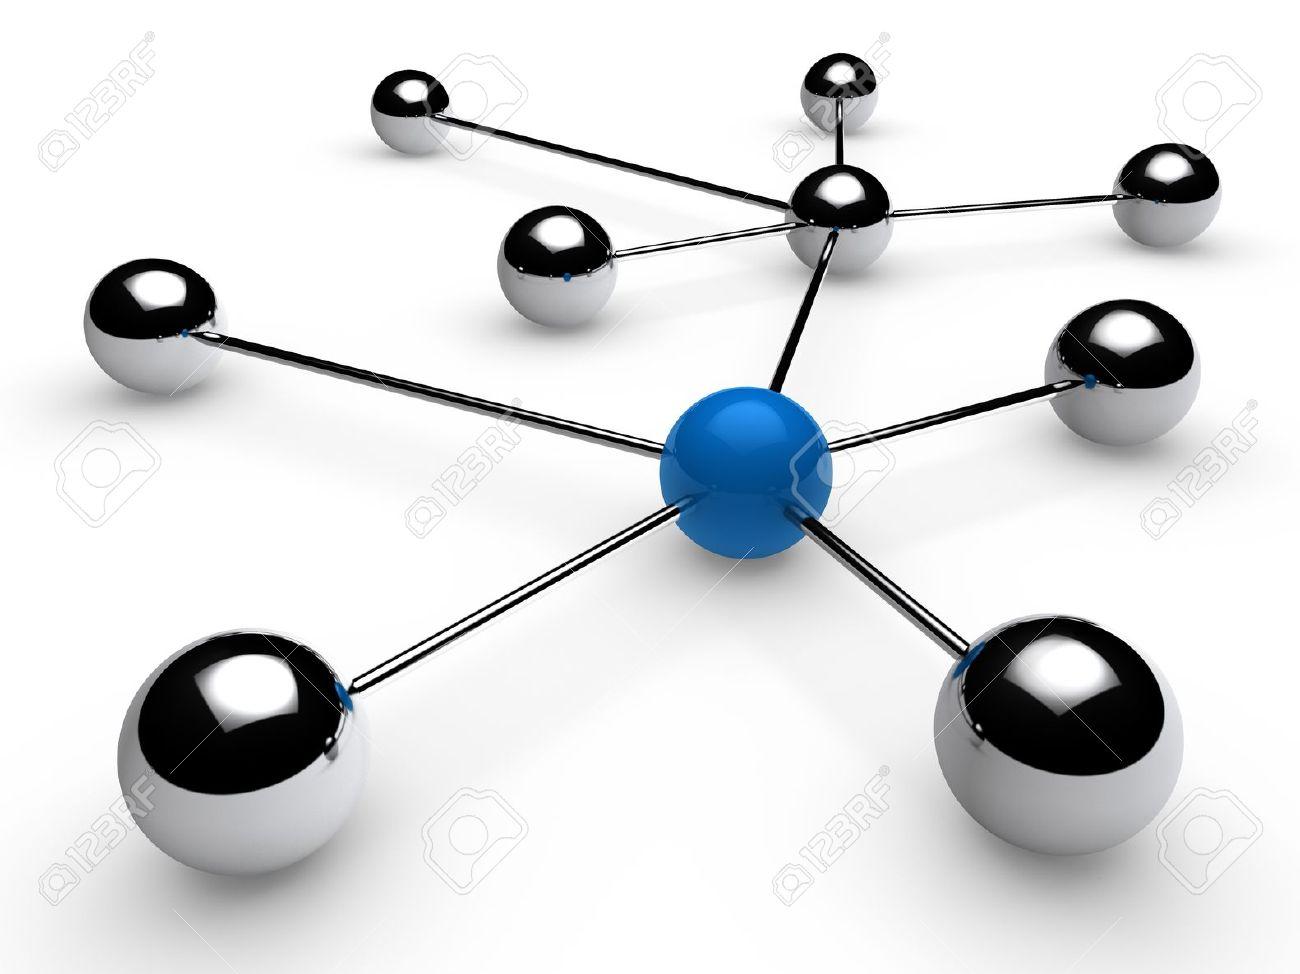 3d, blue, chrome, ball, network, communication, white Stock Photo - 10061575